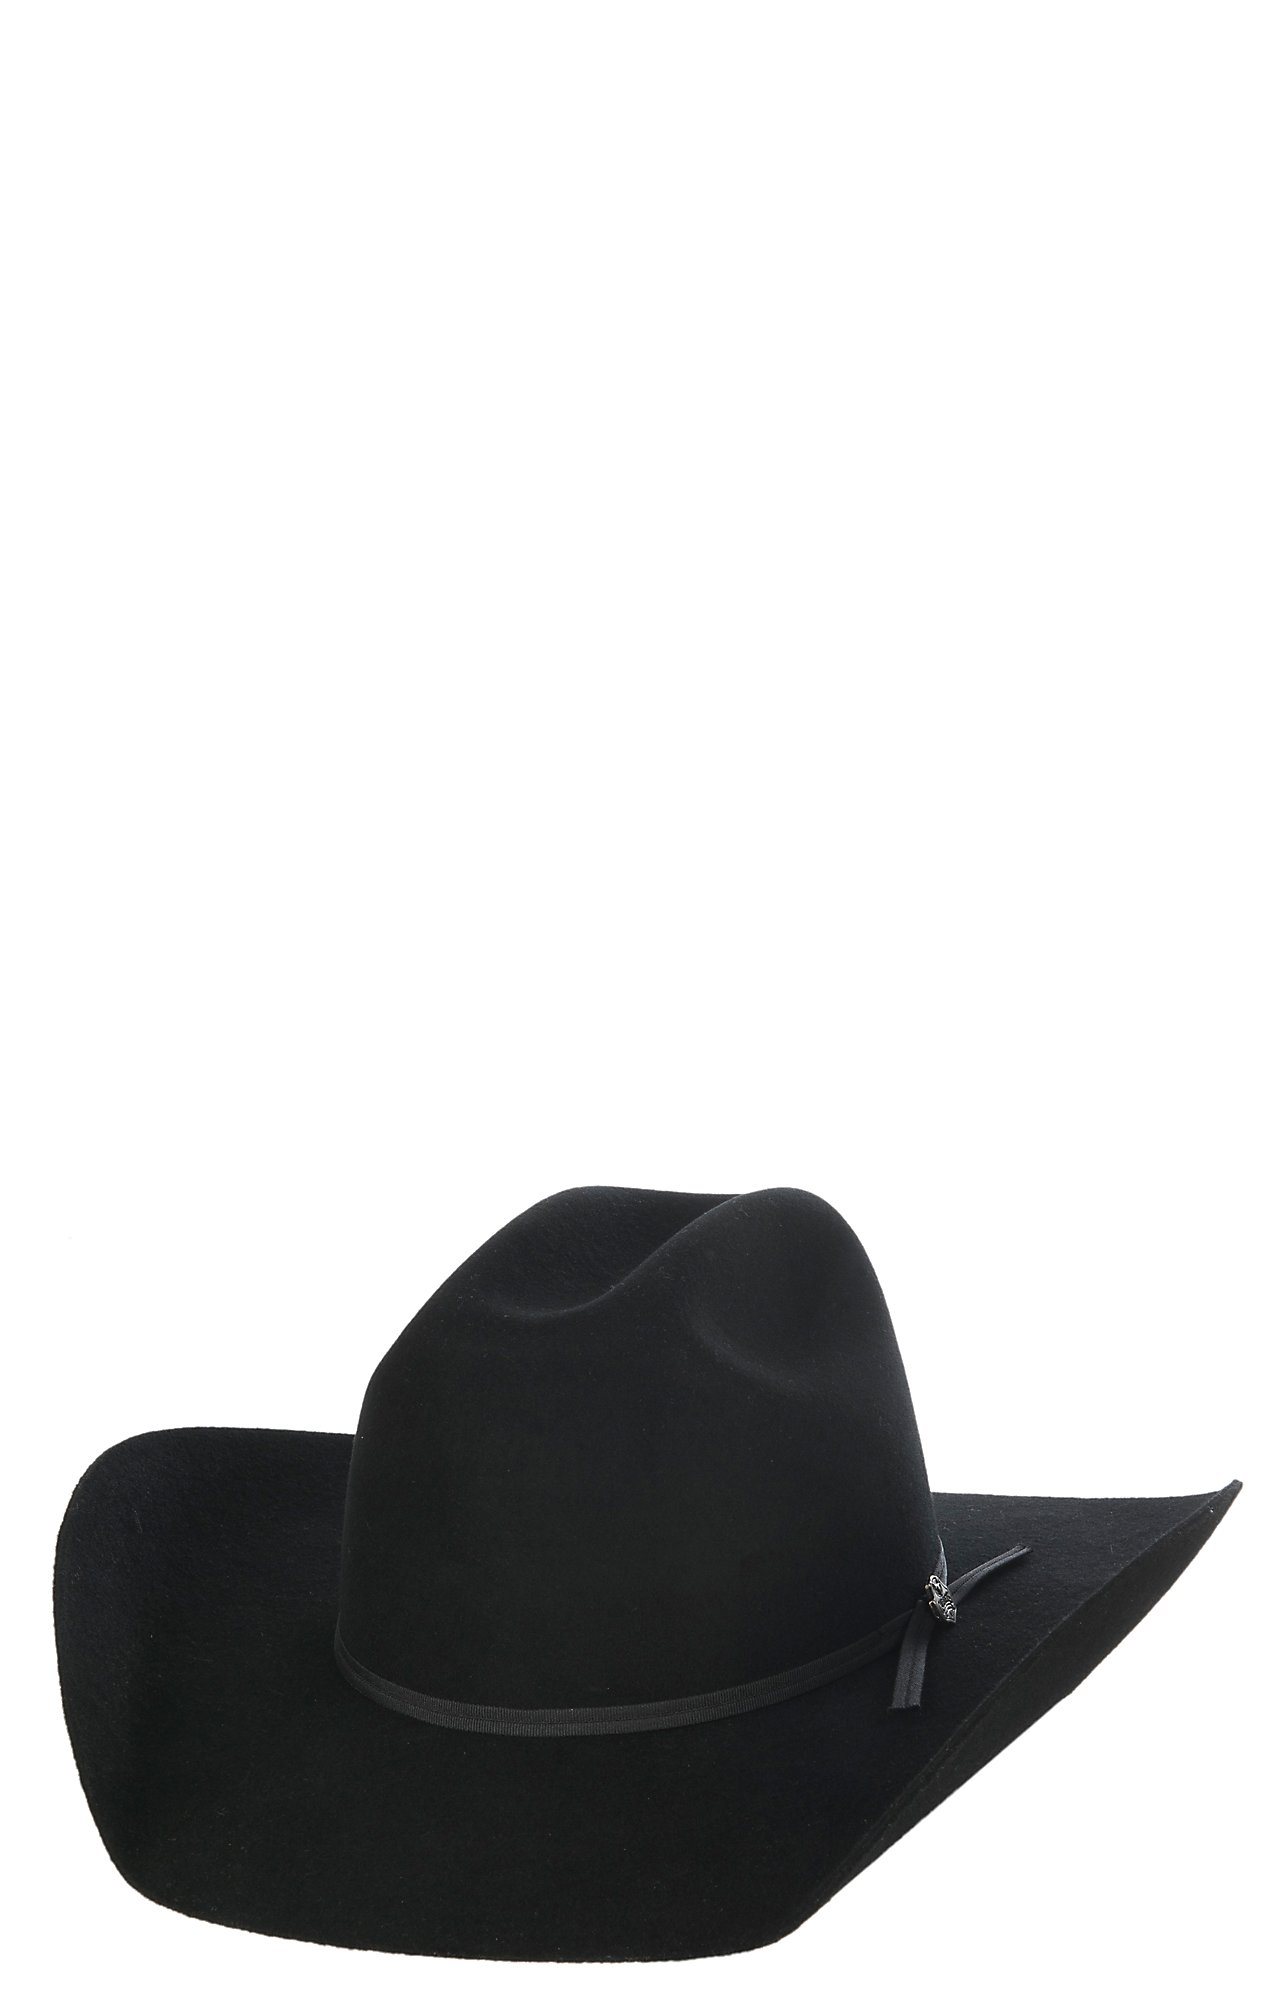 Cavender s Kids 2X Black Cattleman Crown Felt Cowboy Hat 442d22292cf